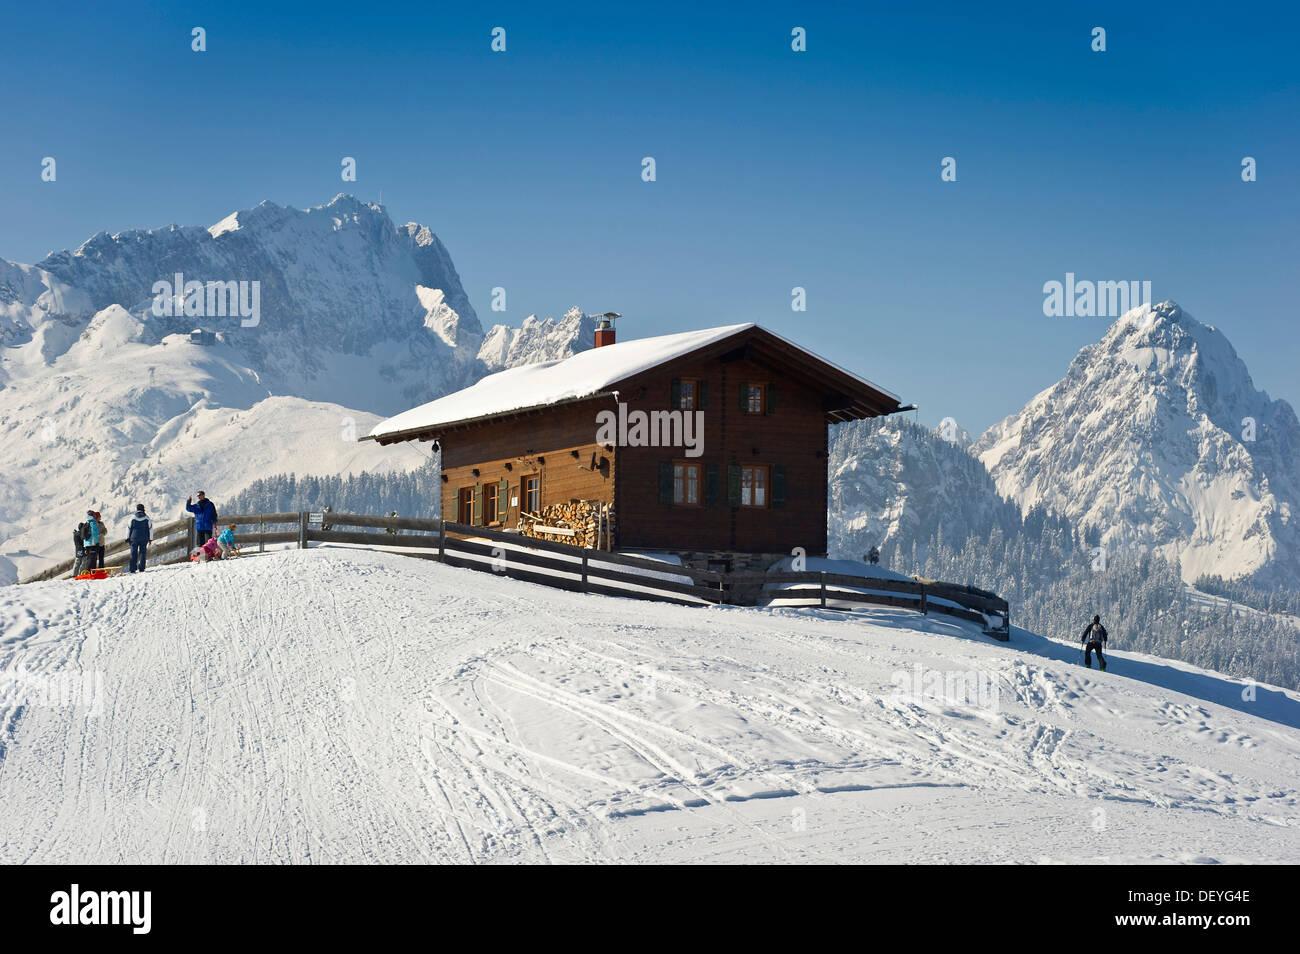 Wooden house on a snow-covered hill, Mt Alpspitze and Mt Zugspitze at back, Eckbauer, Garmisch-Partenkirchen, Upper Stock Photo